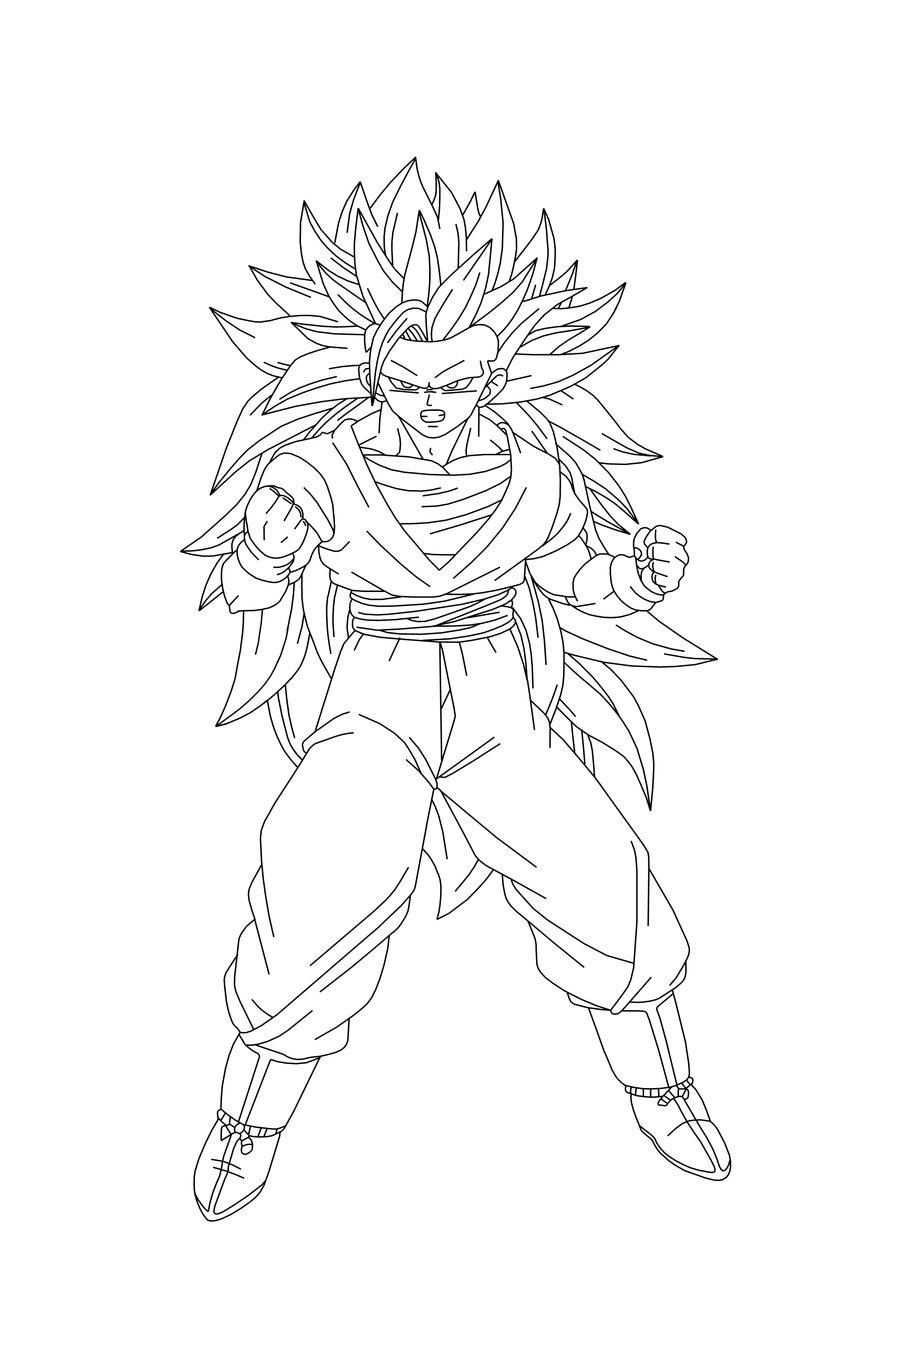 Krilin Dragon Ball Z moreover Goku Vs Naruto 217047031 besides Coloriage Pixel Art A Imprimer further Coloriage De Dragon Ball Z Sangoku Super Sayen 6 in addition Ultra Instinct Goku Lineart 711147788. on dbz coloring pages